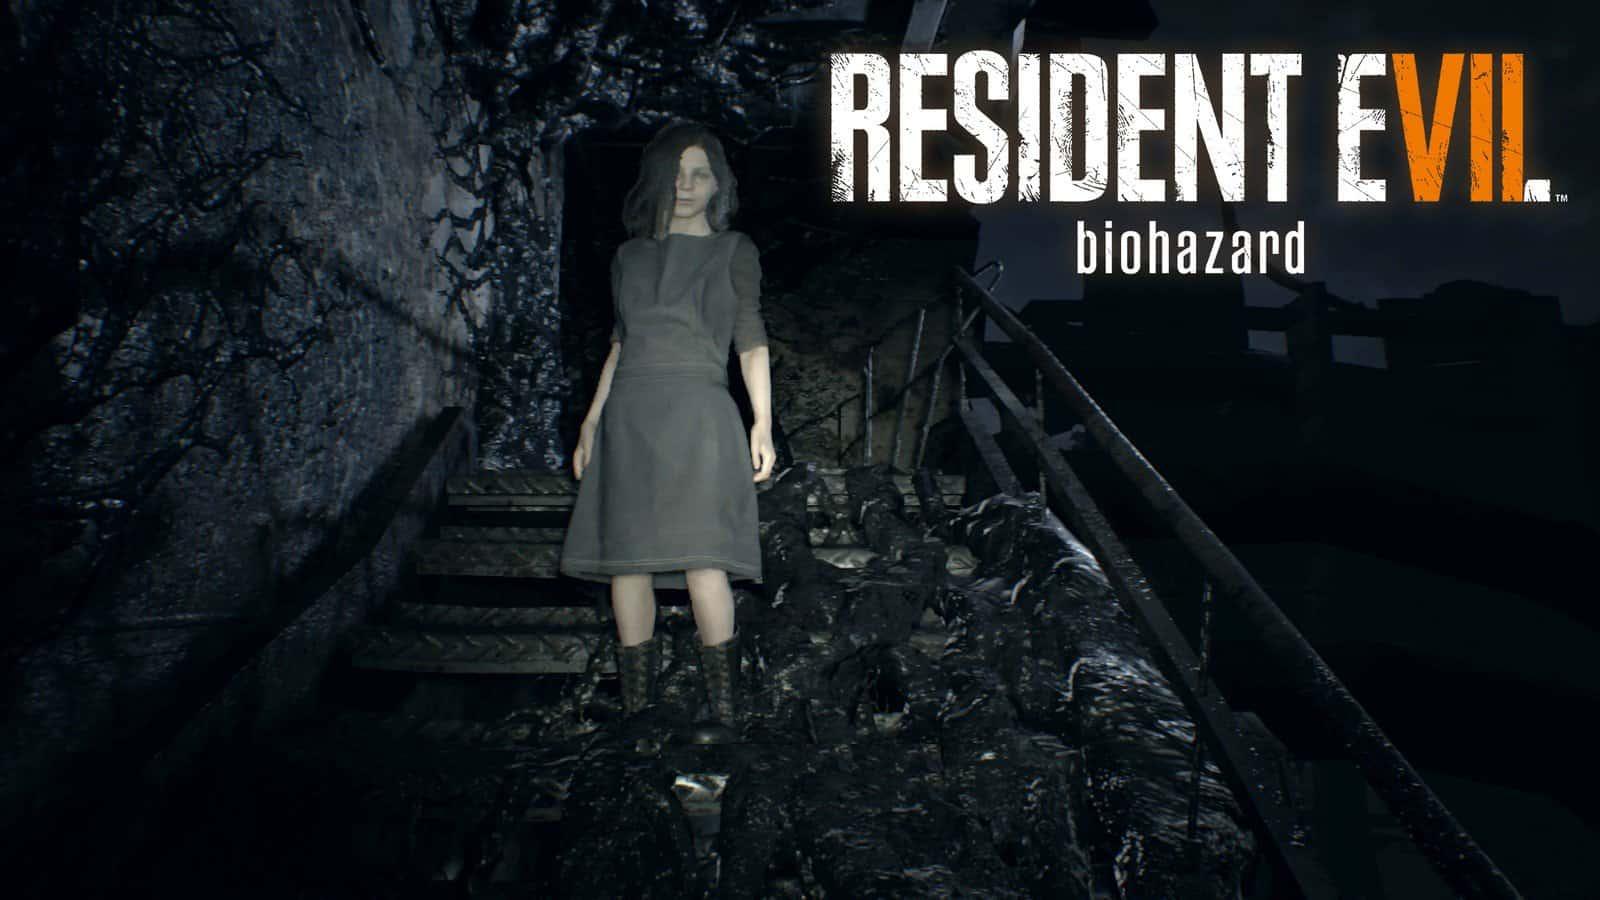 Resident Evil 7 Biohazard Apk iOS Latest Version Free Download